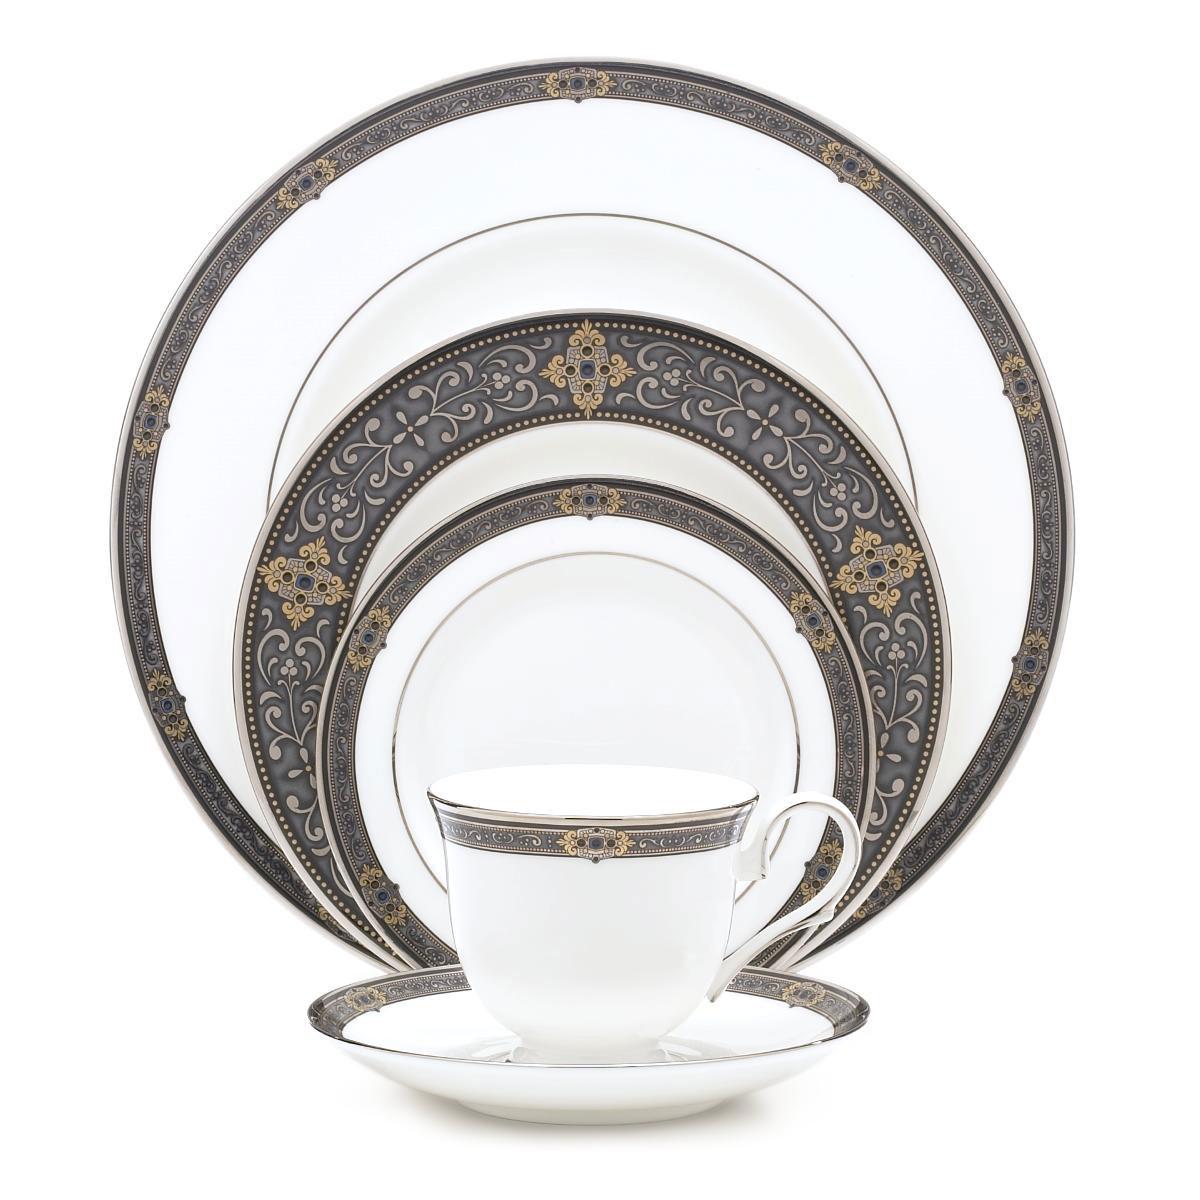 Lenox China Vintage Jewel, 5 Piece Place Setting